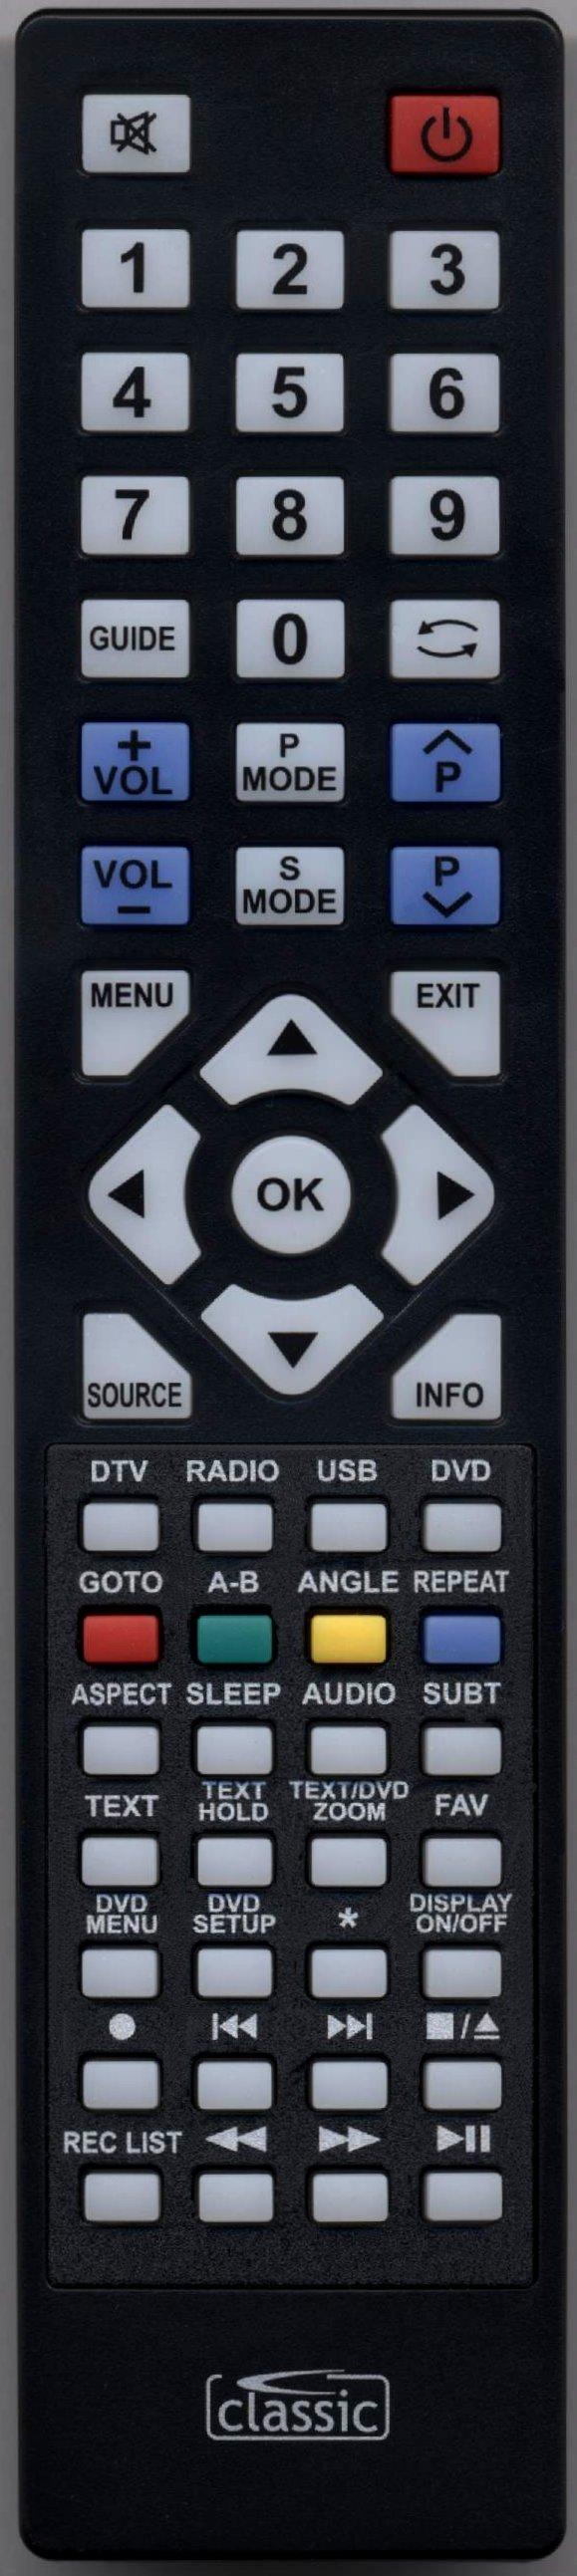 BLAUPUNKT 32233I Remote Control